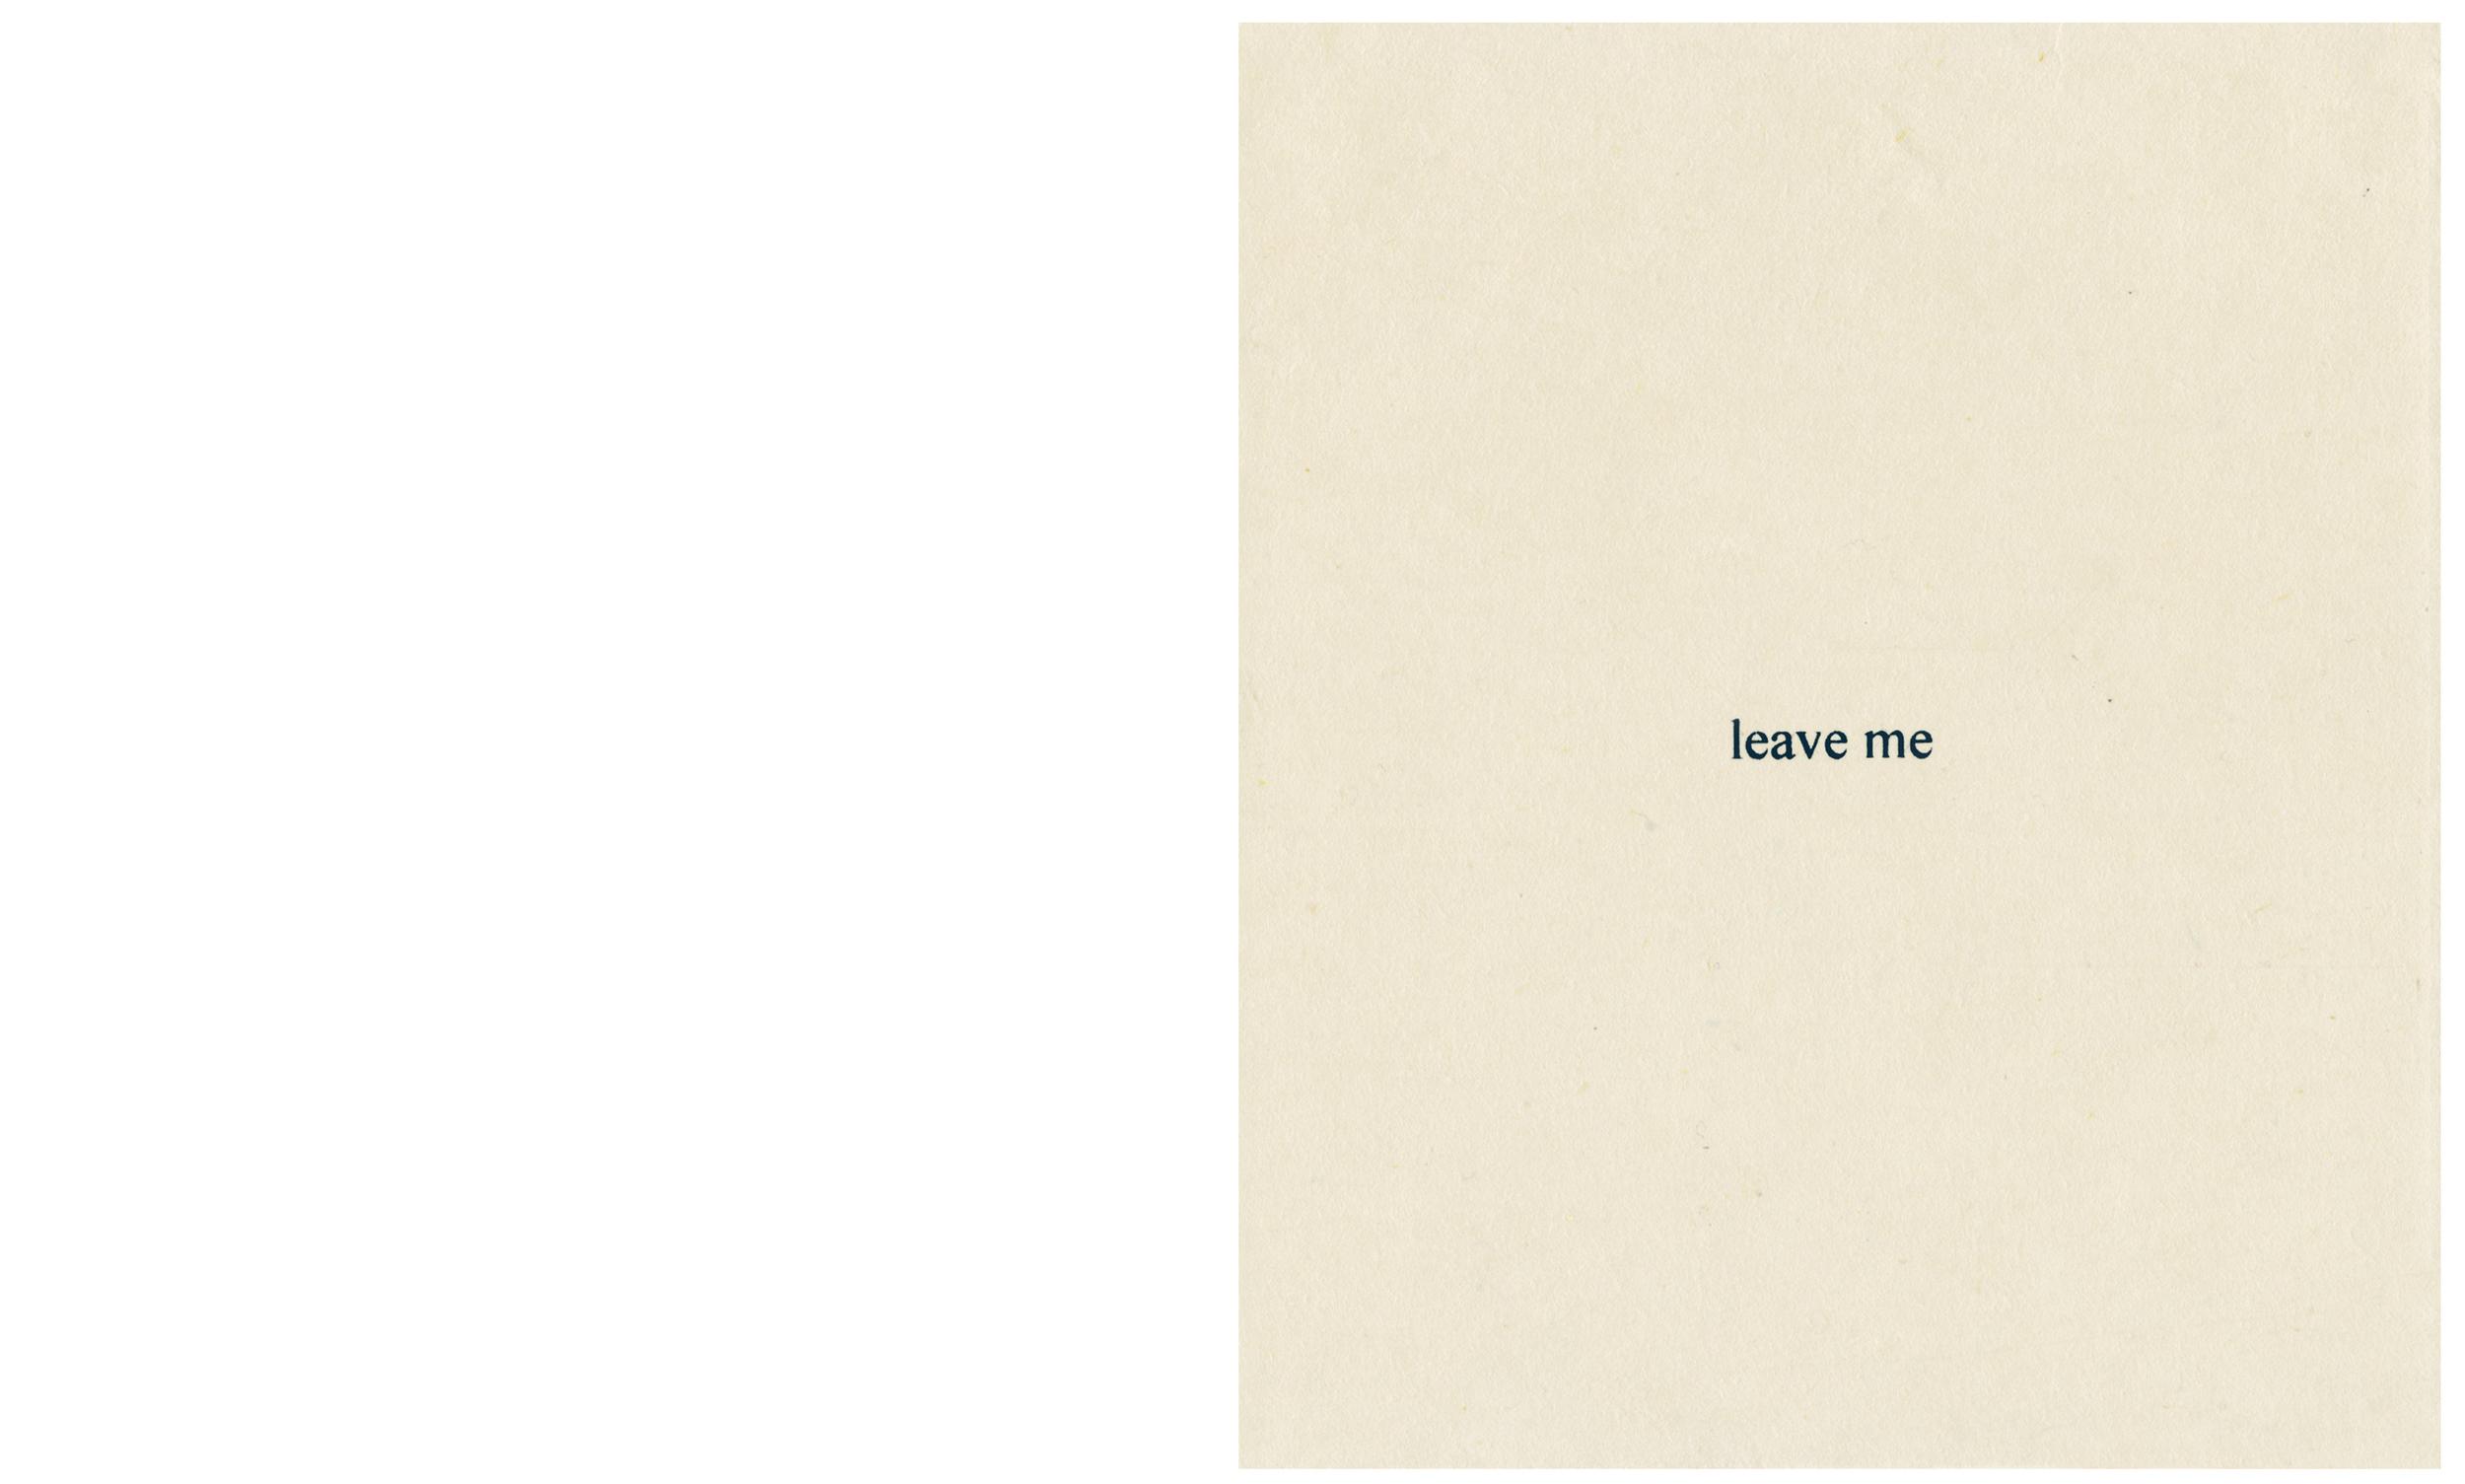 Take Me / Leave Me